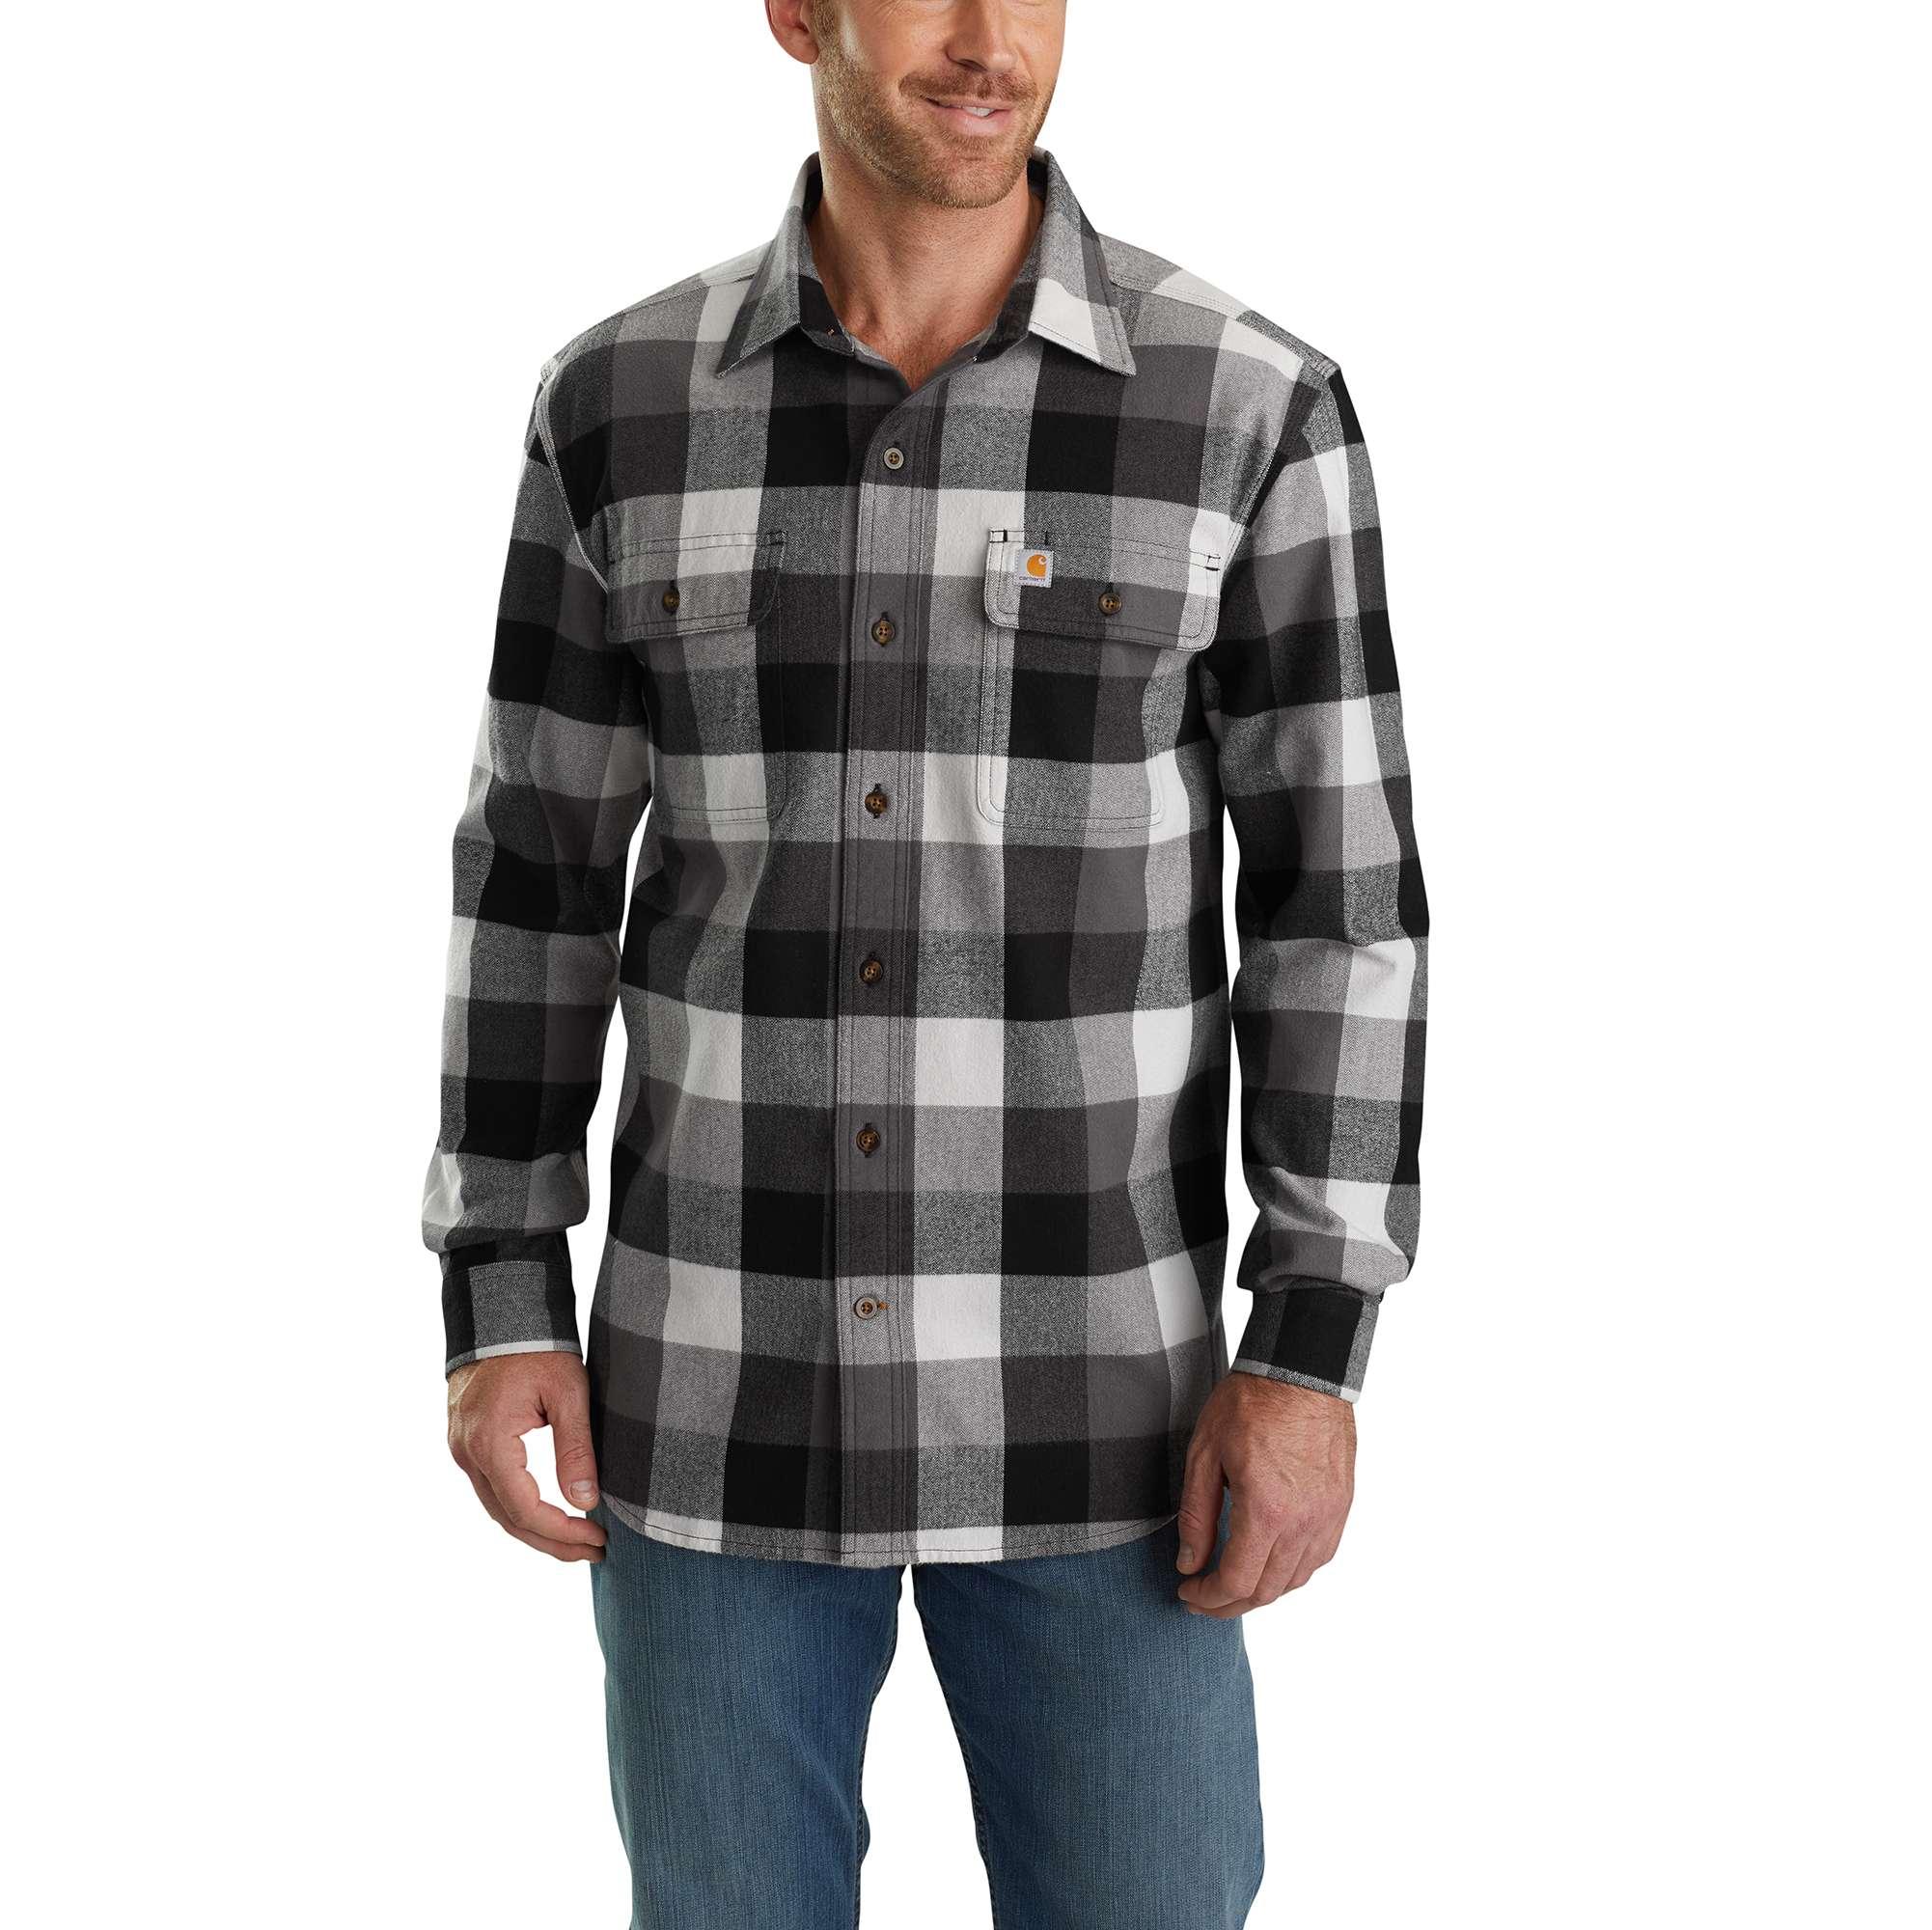 Men's Hubbard Plaid Long Sleeve Shirt, Gray, swatch